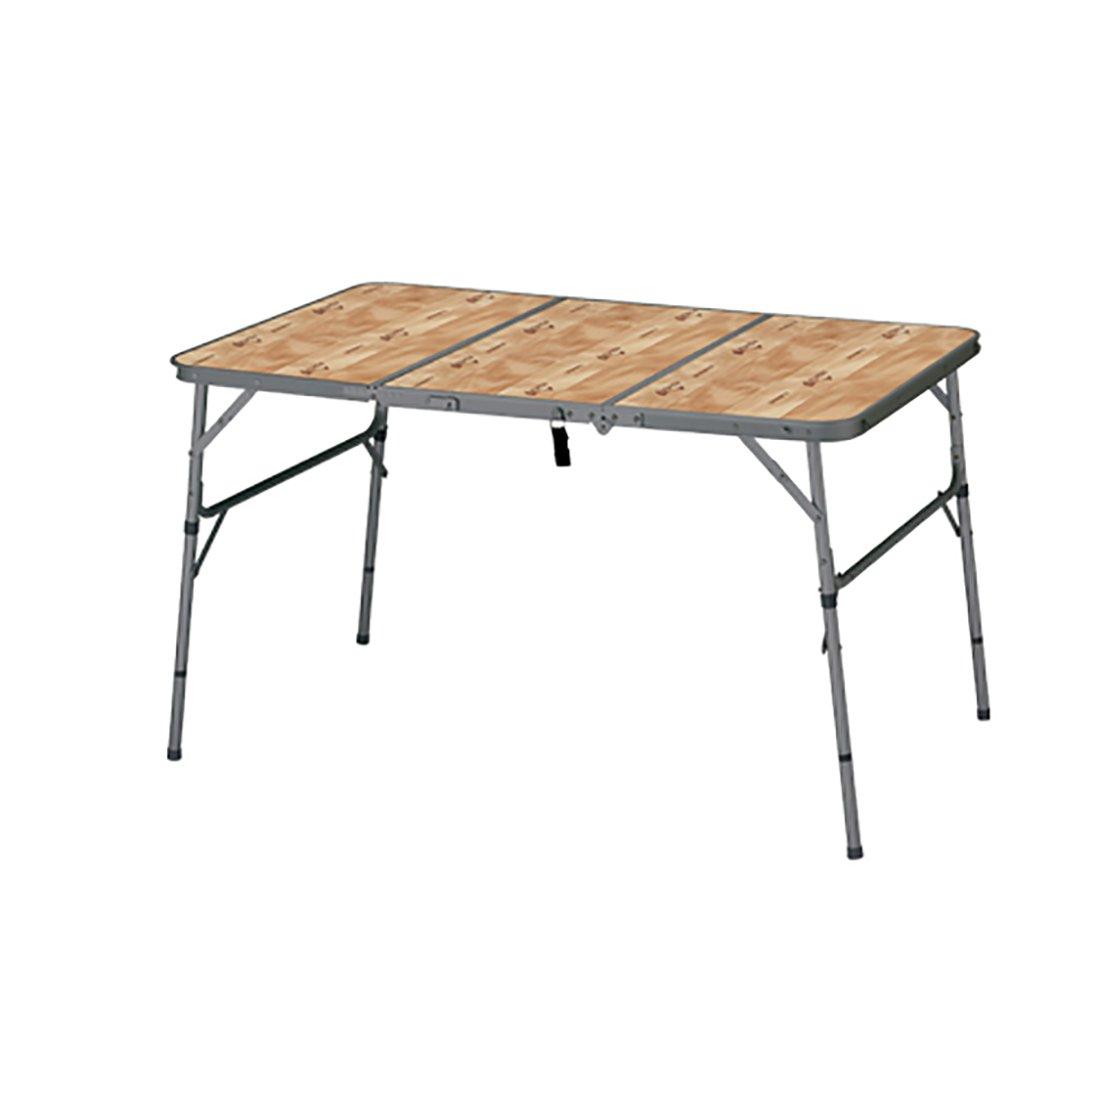 Titan slim 3 folding table